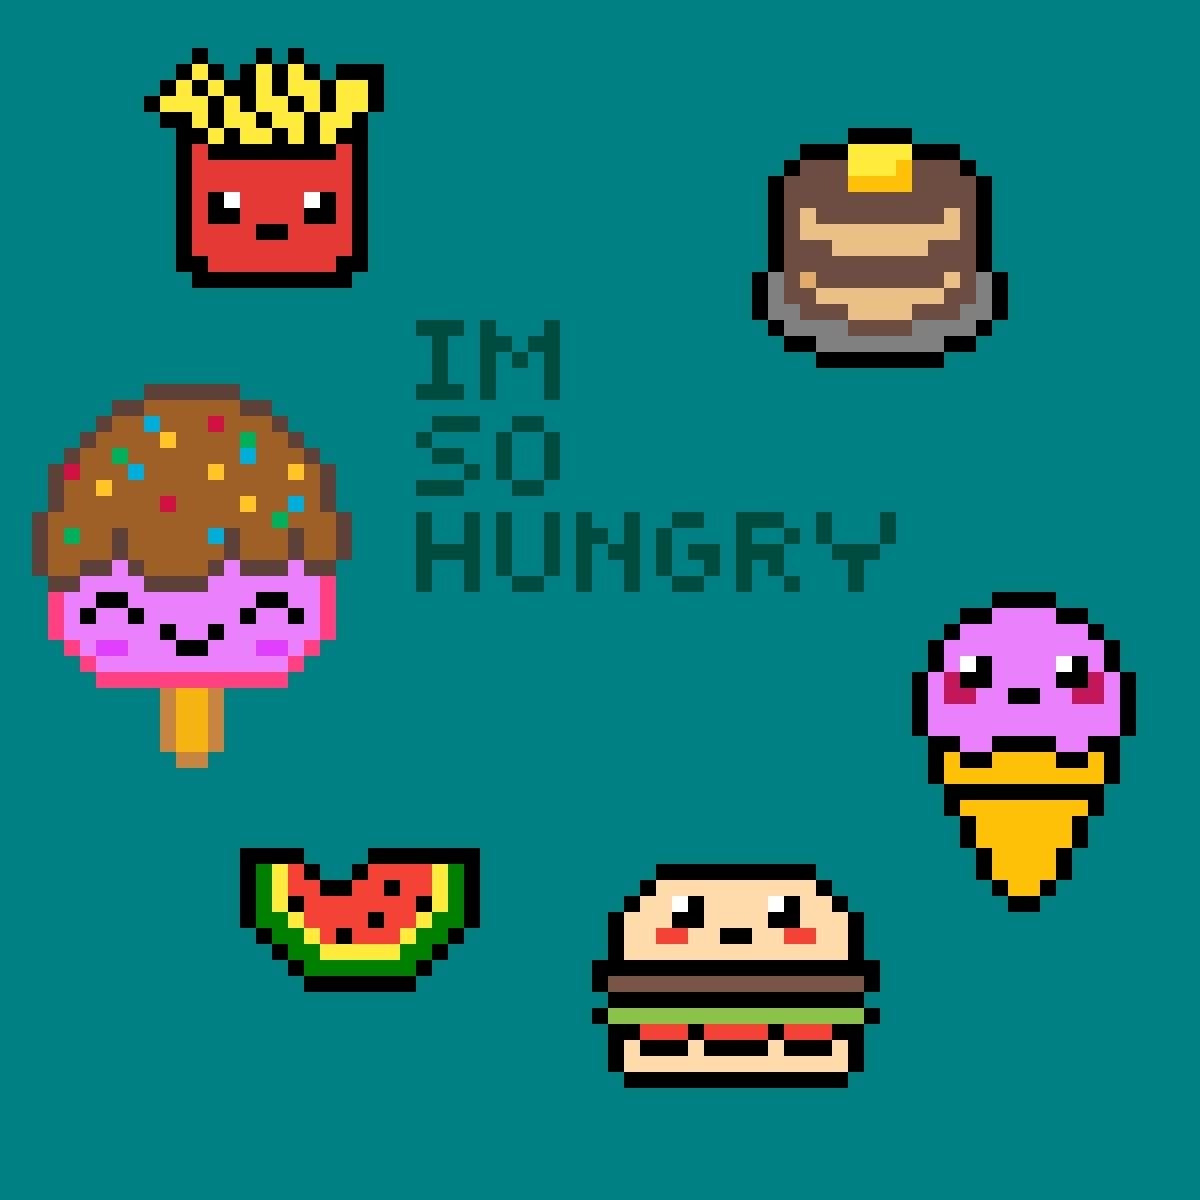 8-bit food